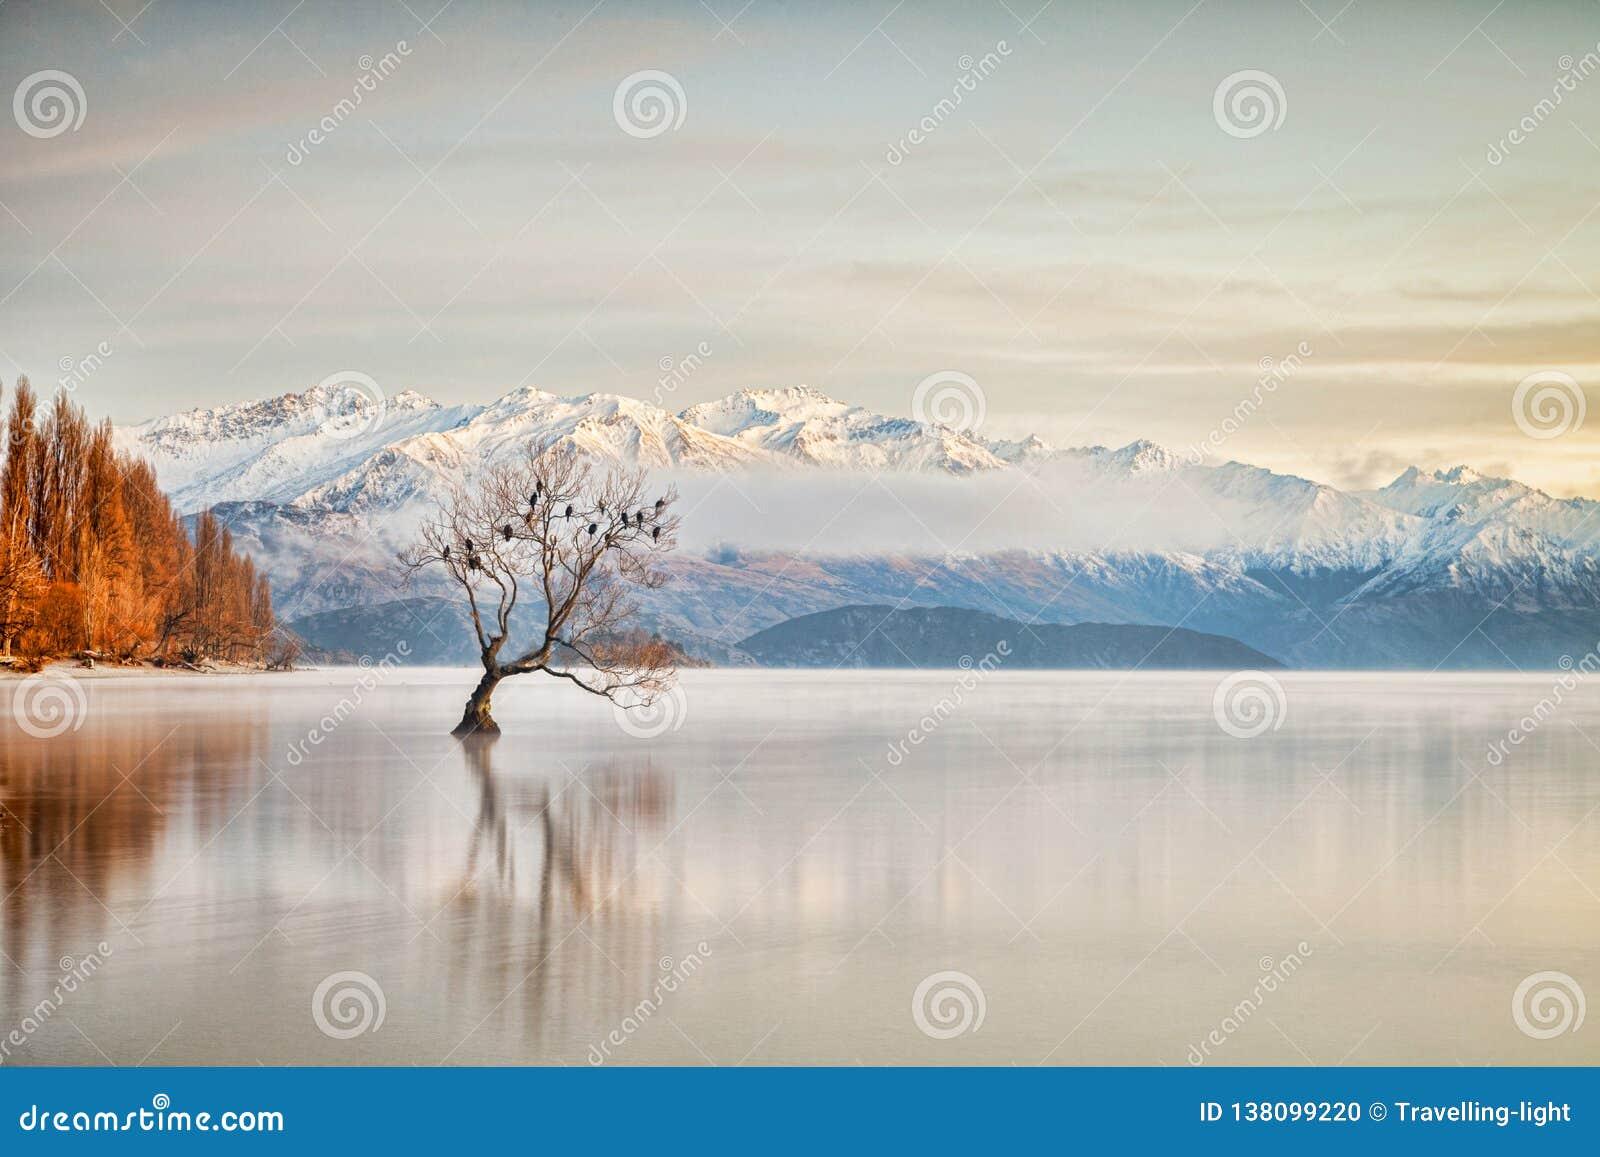 Lac Wanaka Otago Nouvelle-Zélande